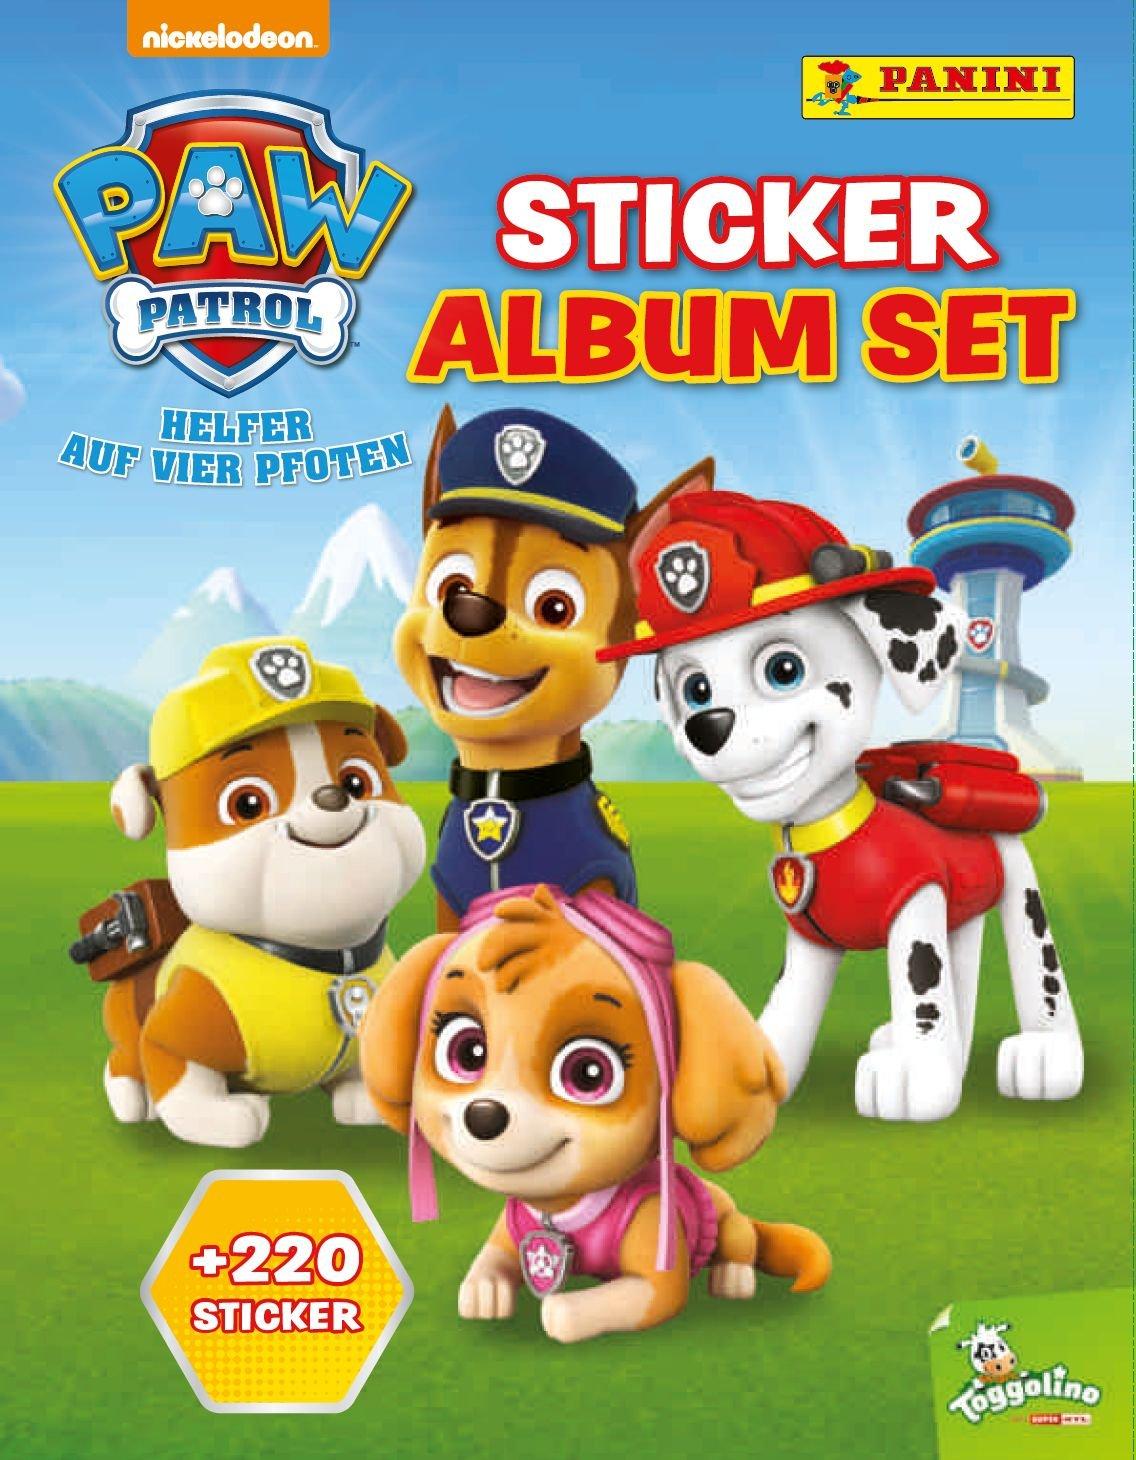 PAW Patrol Sticker Album Set